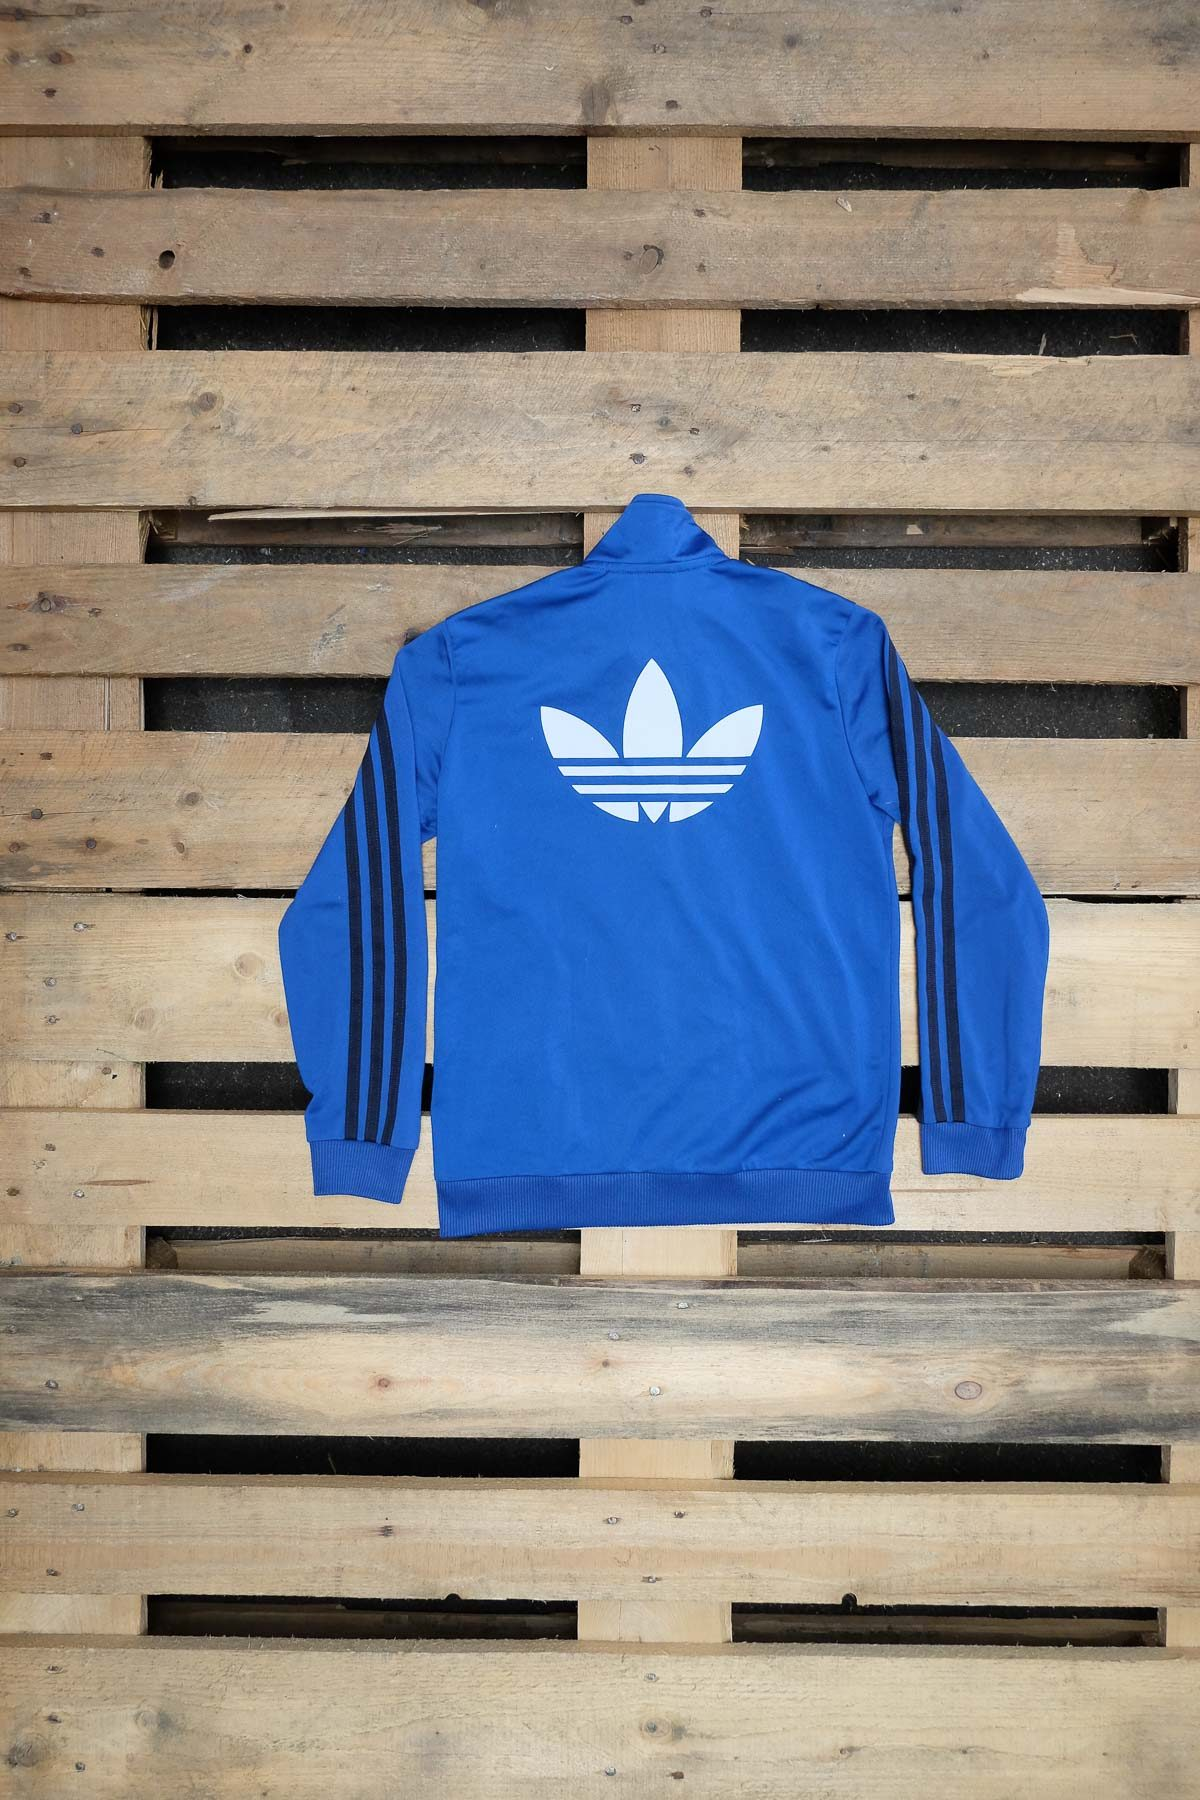 Adidas Original FELPA VINTAGE